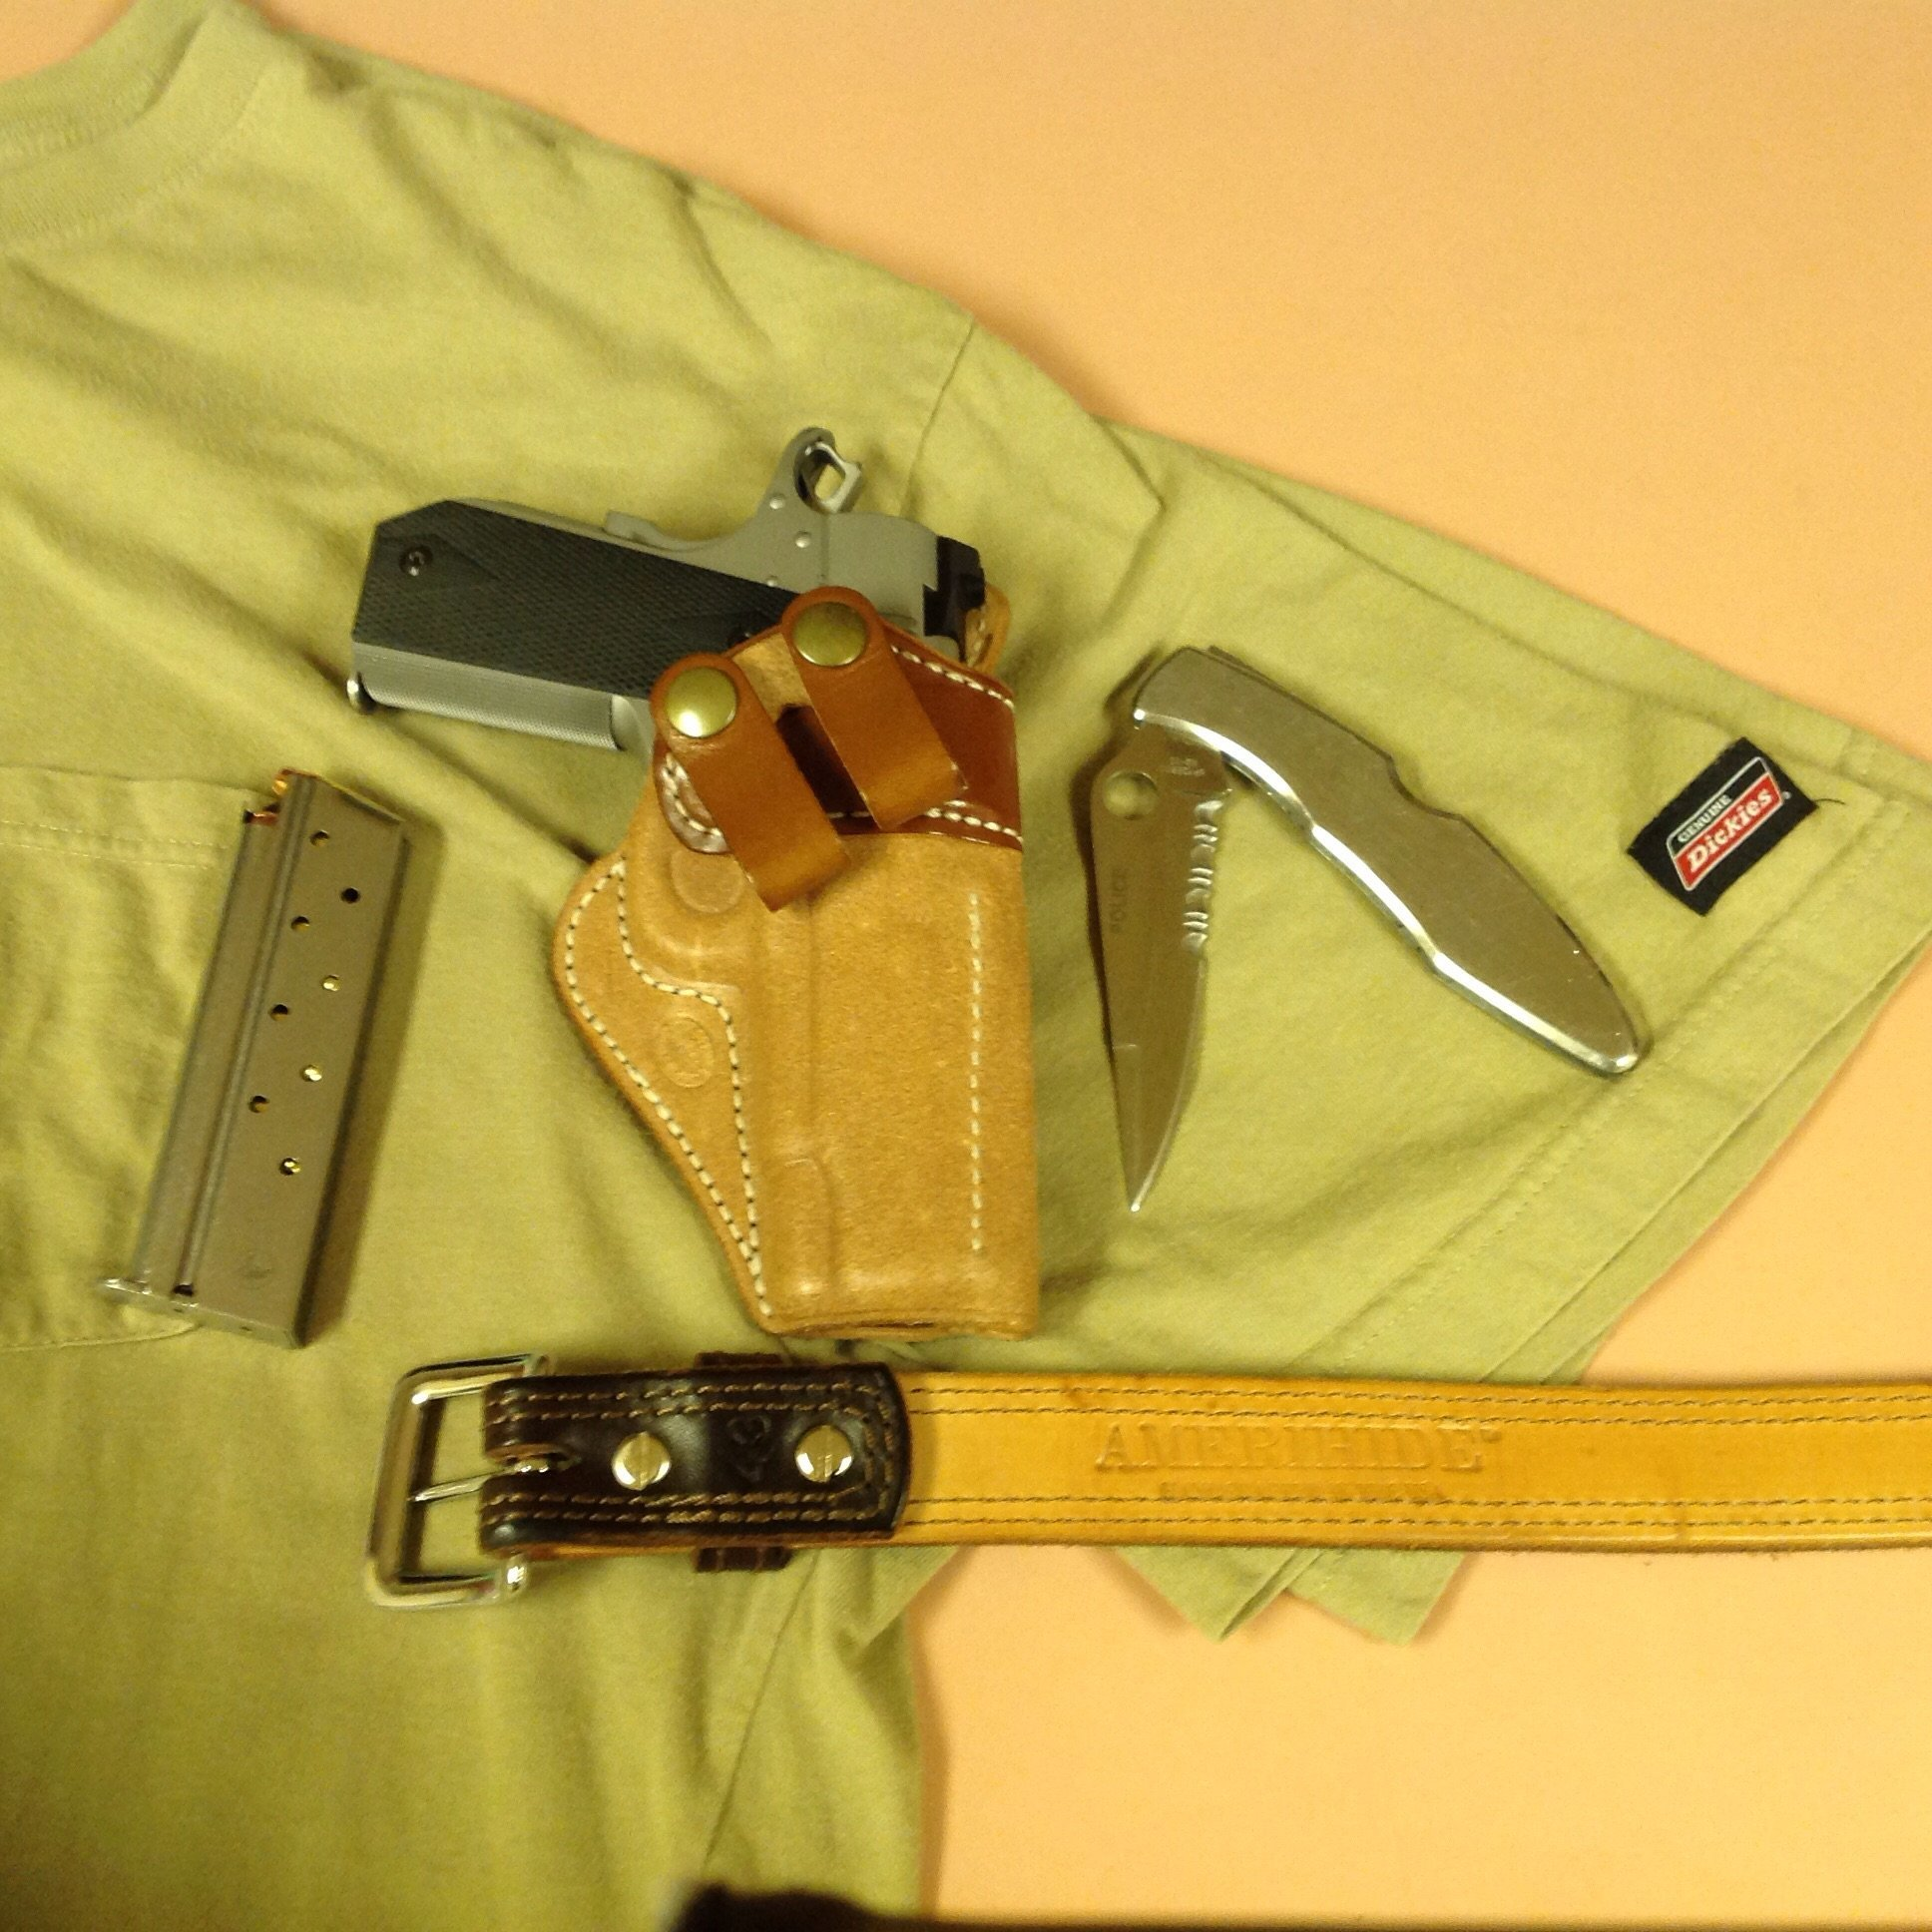 V-BOB or Guardian for concealed carry? - 1911Forum